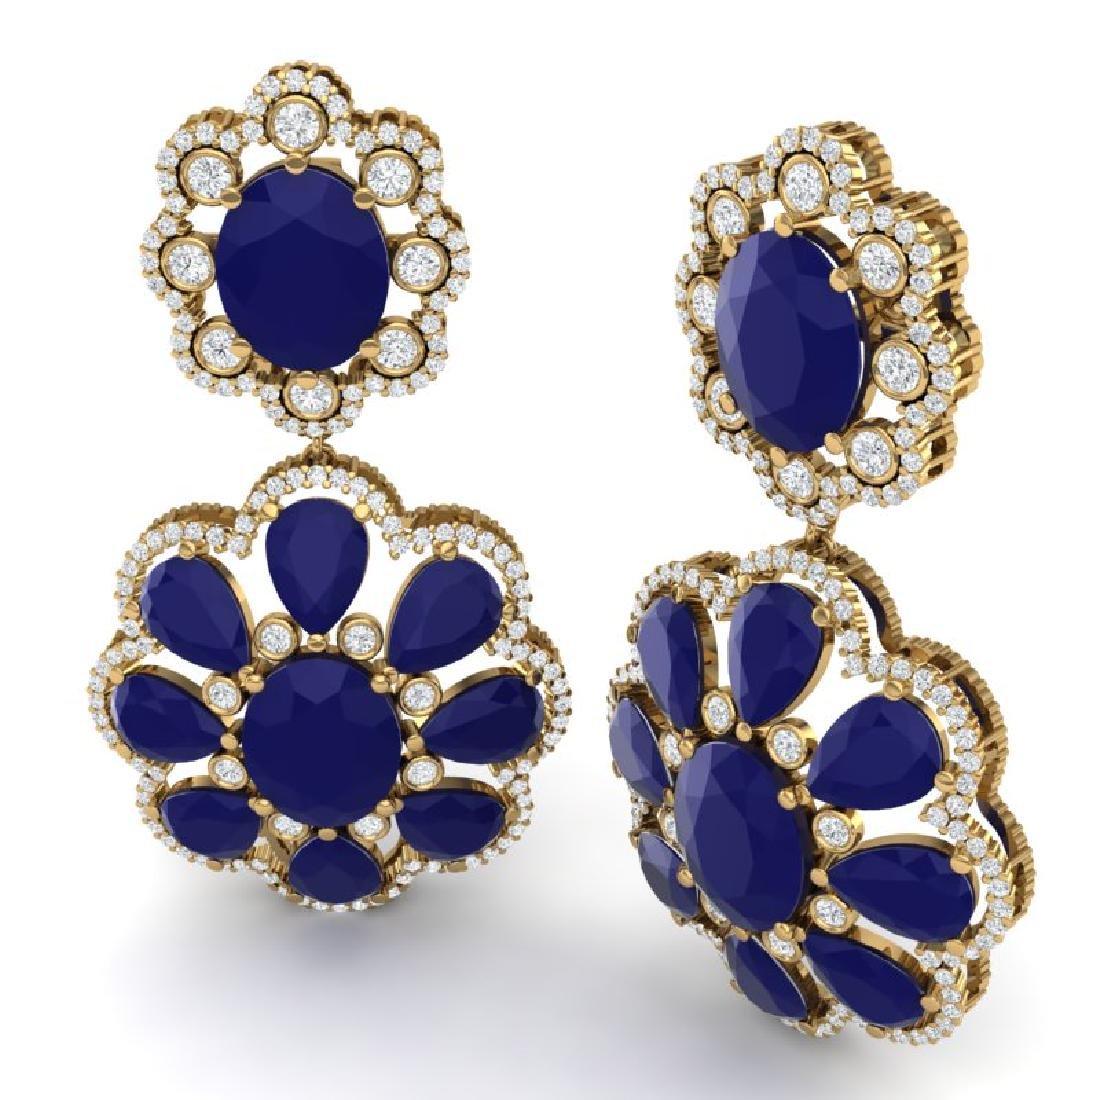 33.88 CTW Royalty Sapphire & VS Diamond Earrings 18K - 3